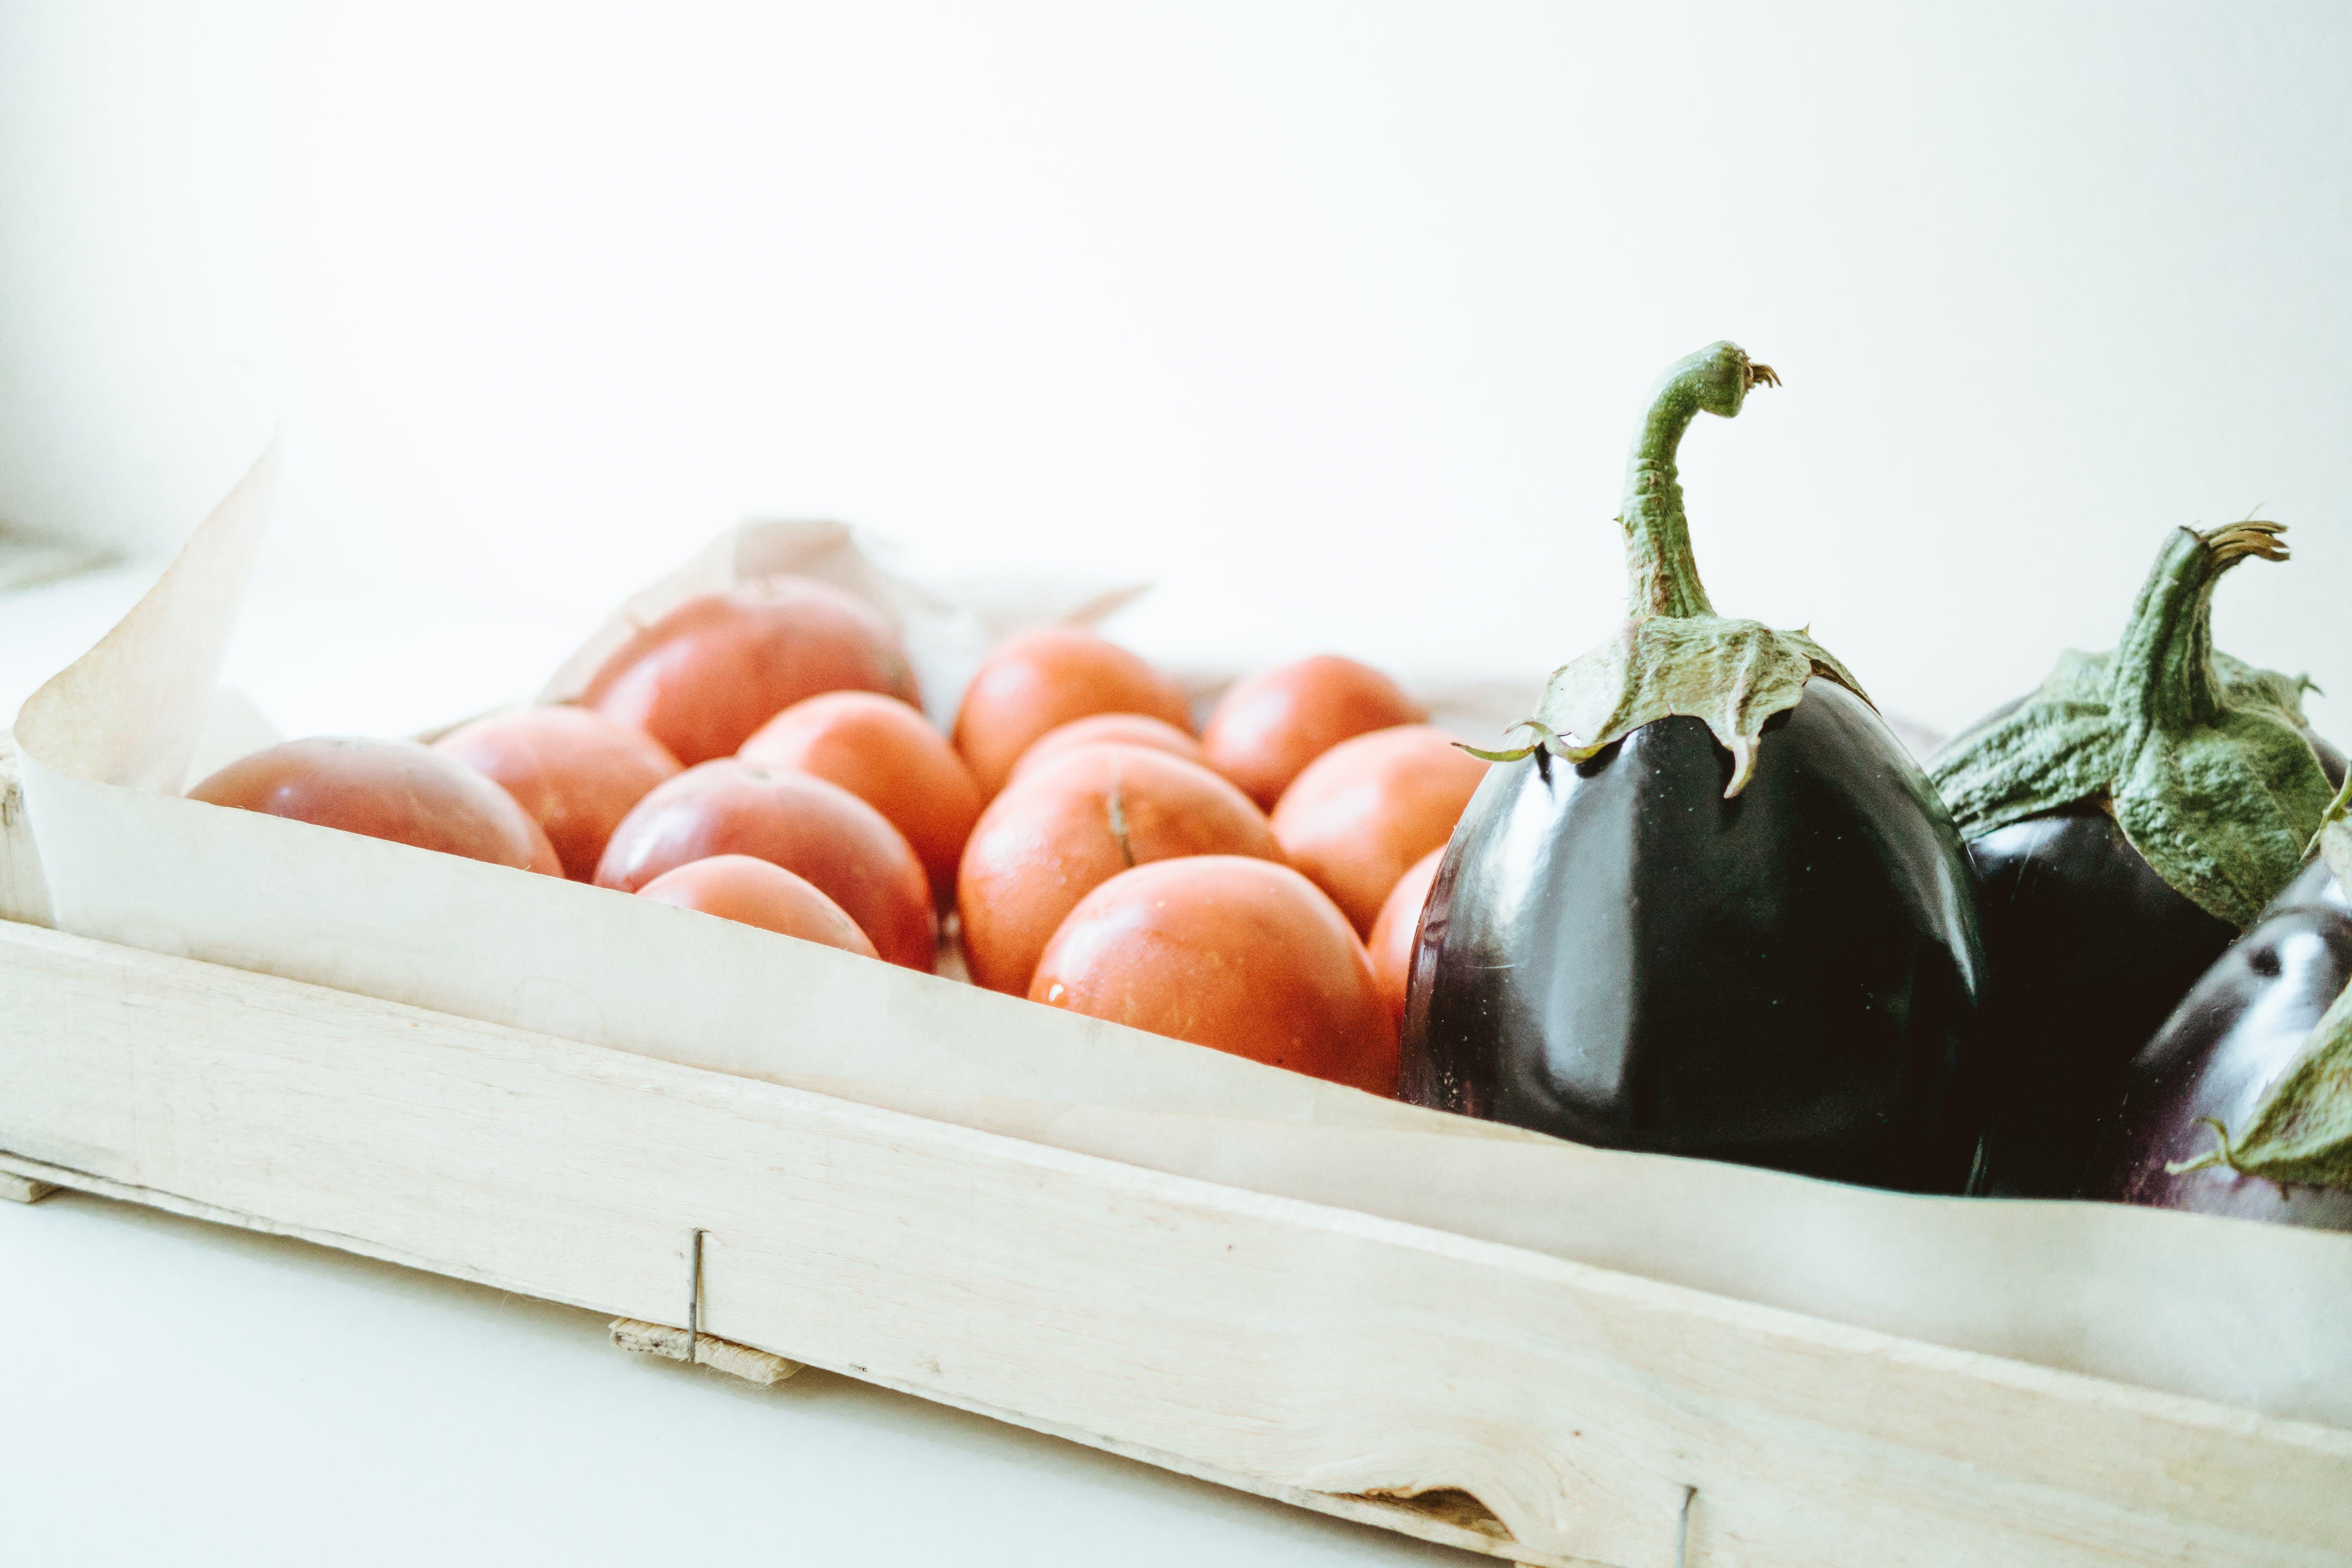 Close-up Photo of Purple Eggplants and Round Orange Fruits